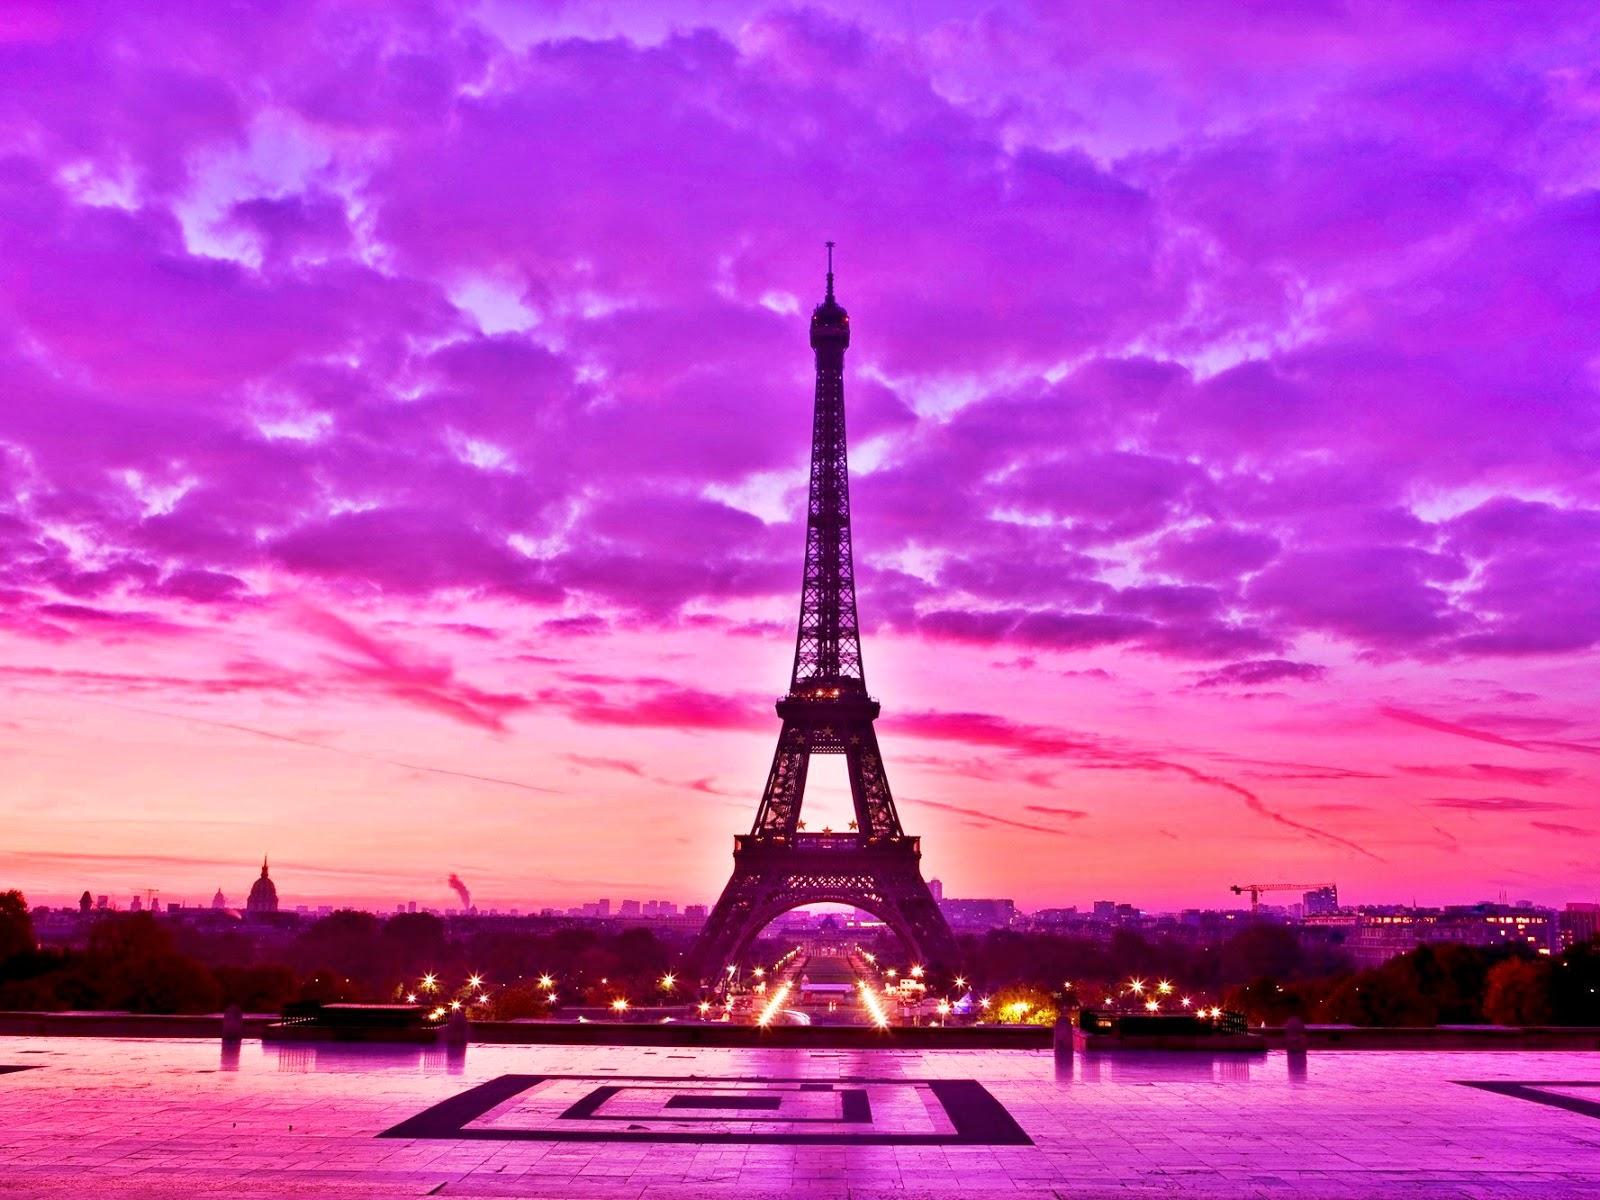 eiffel tower paris pink - photo #4